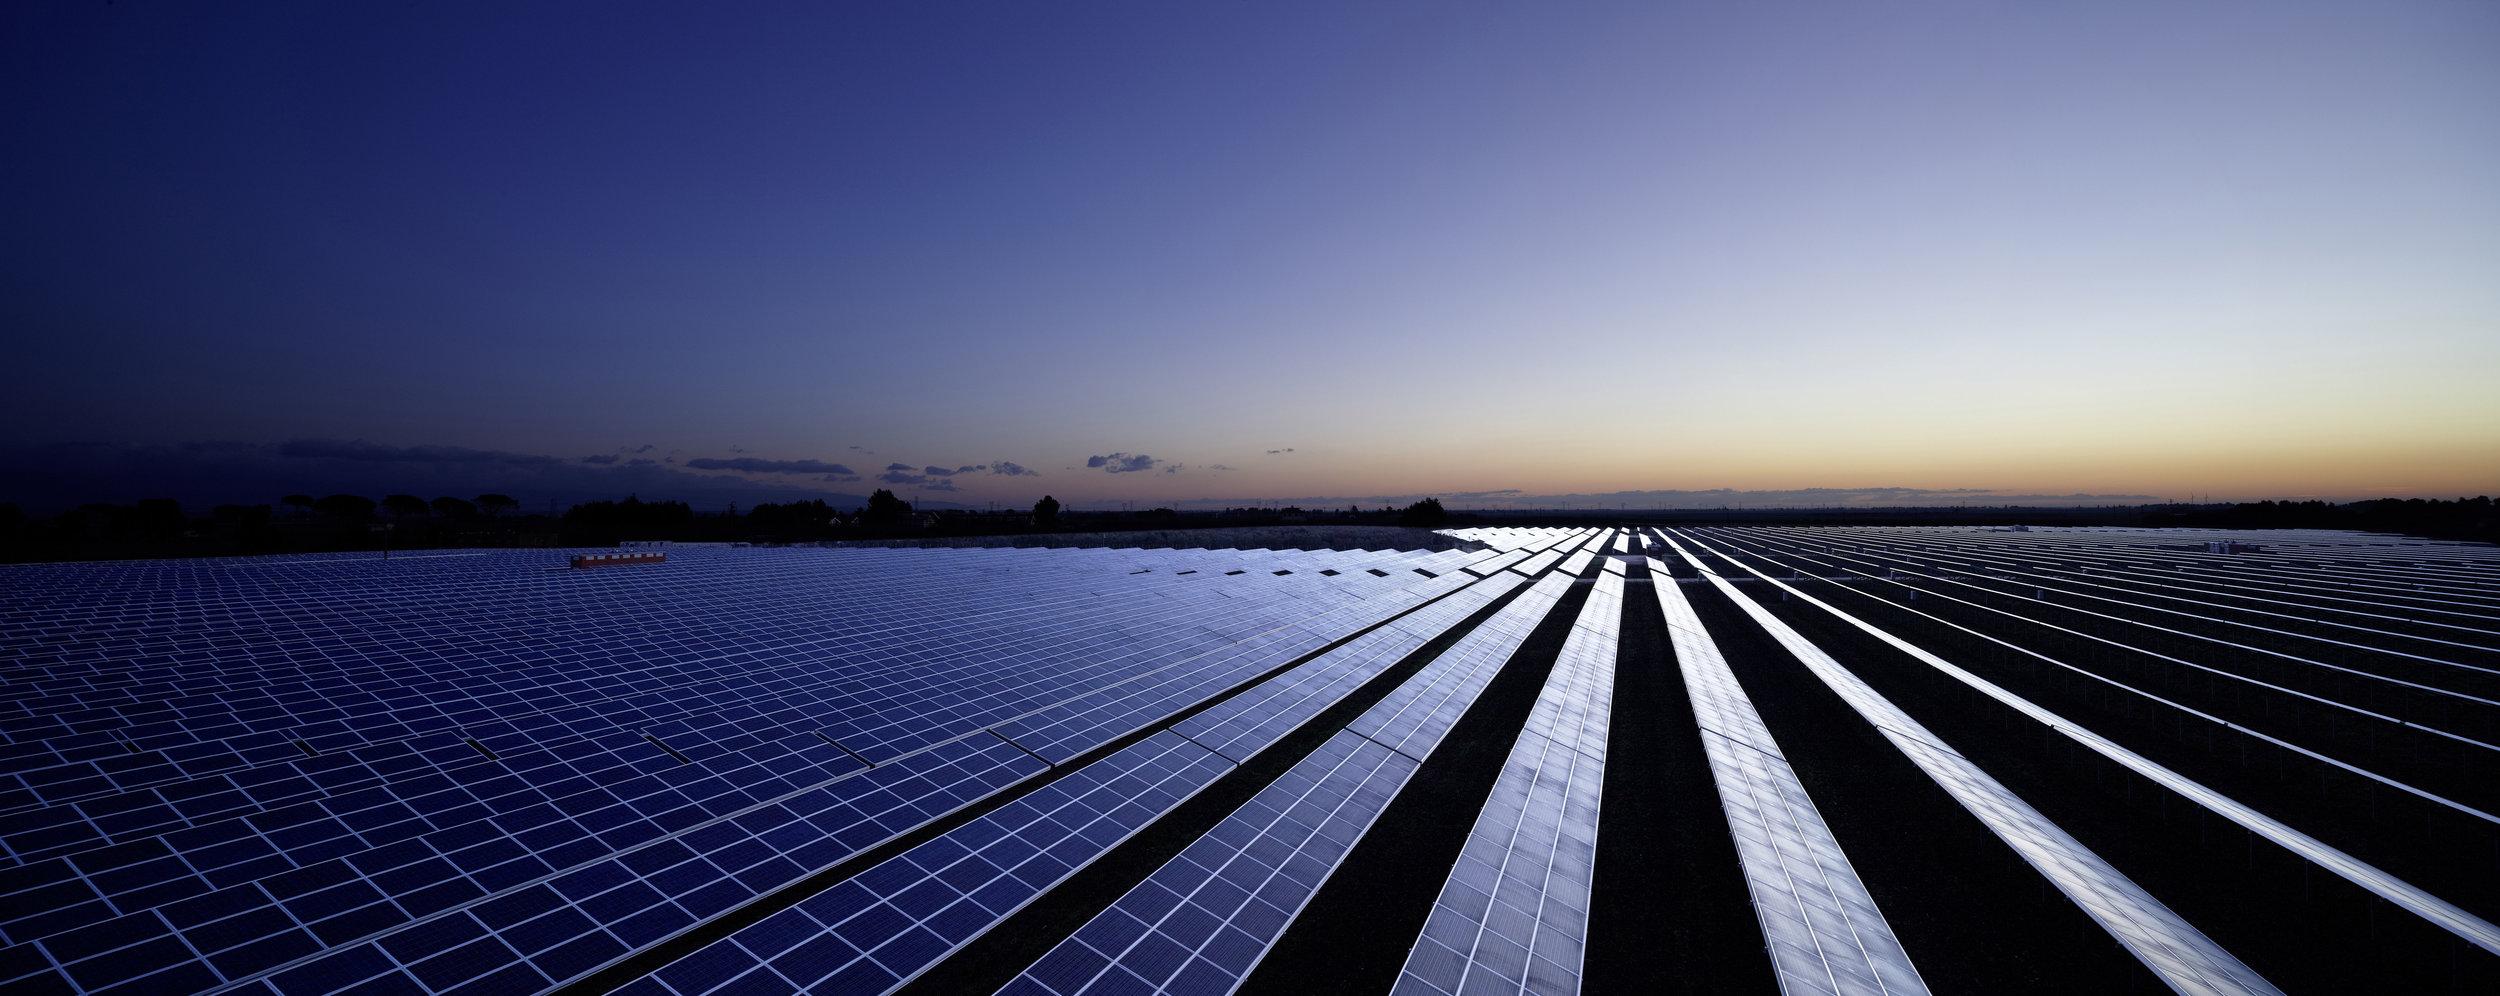 Solar Photovoltaic Power Plant.jpg